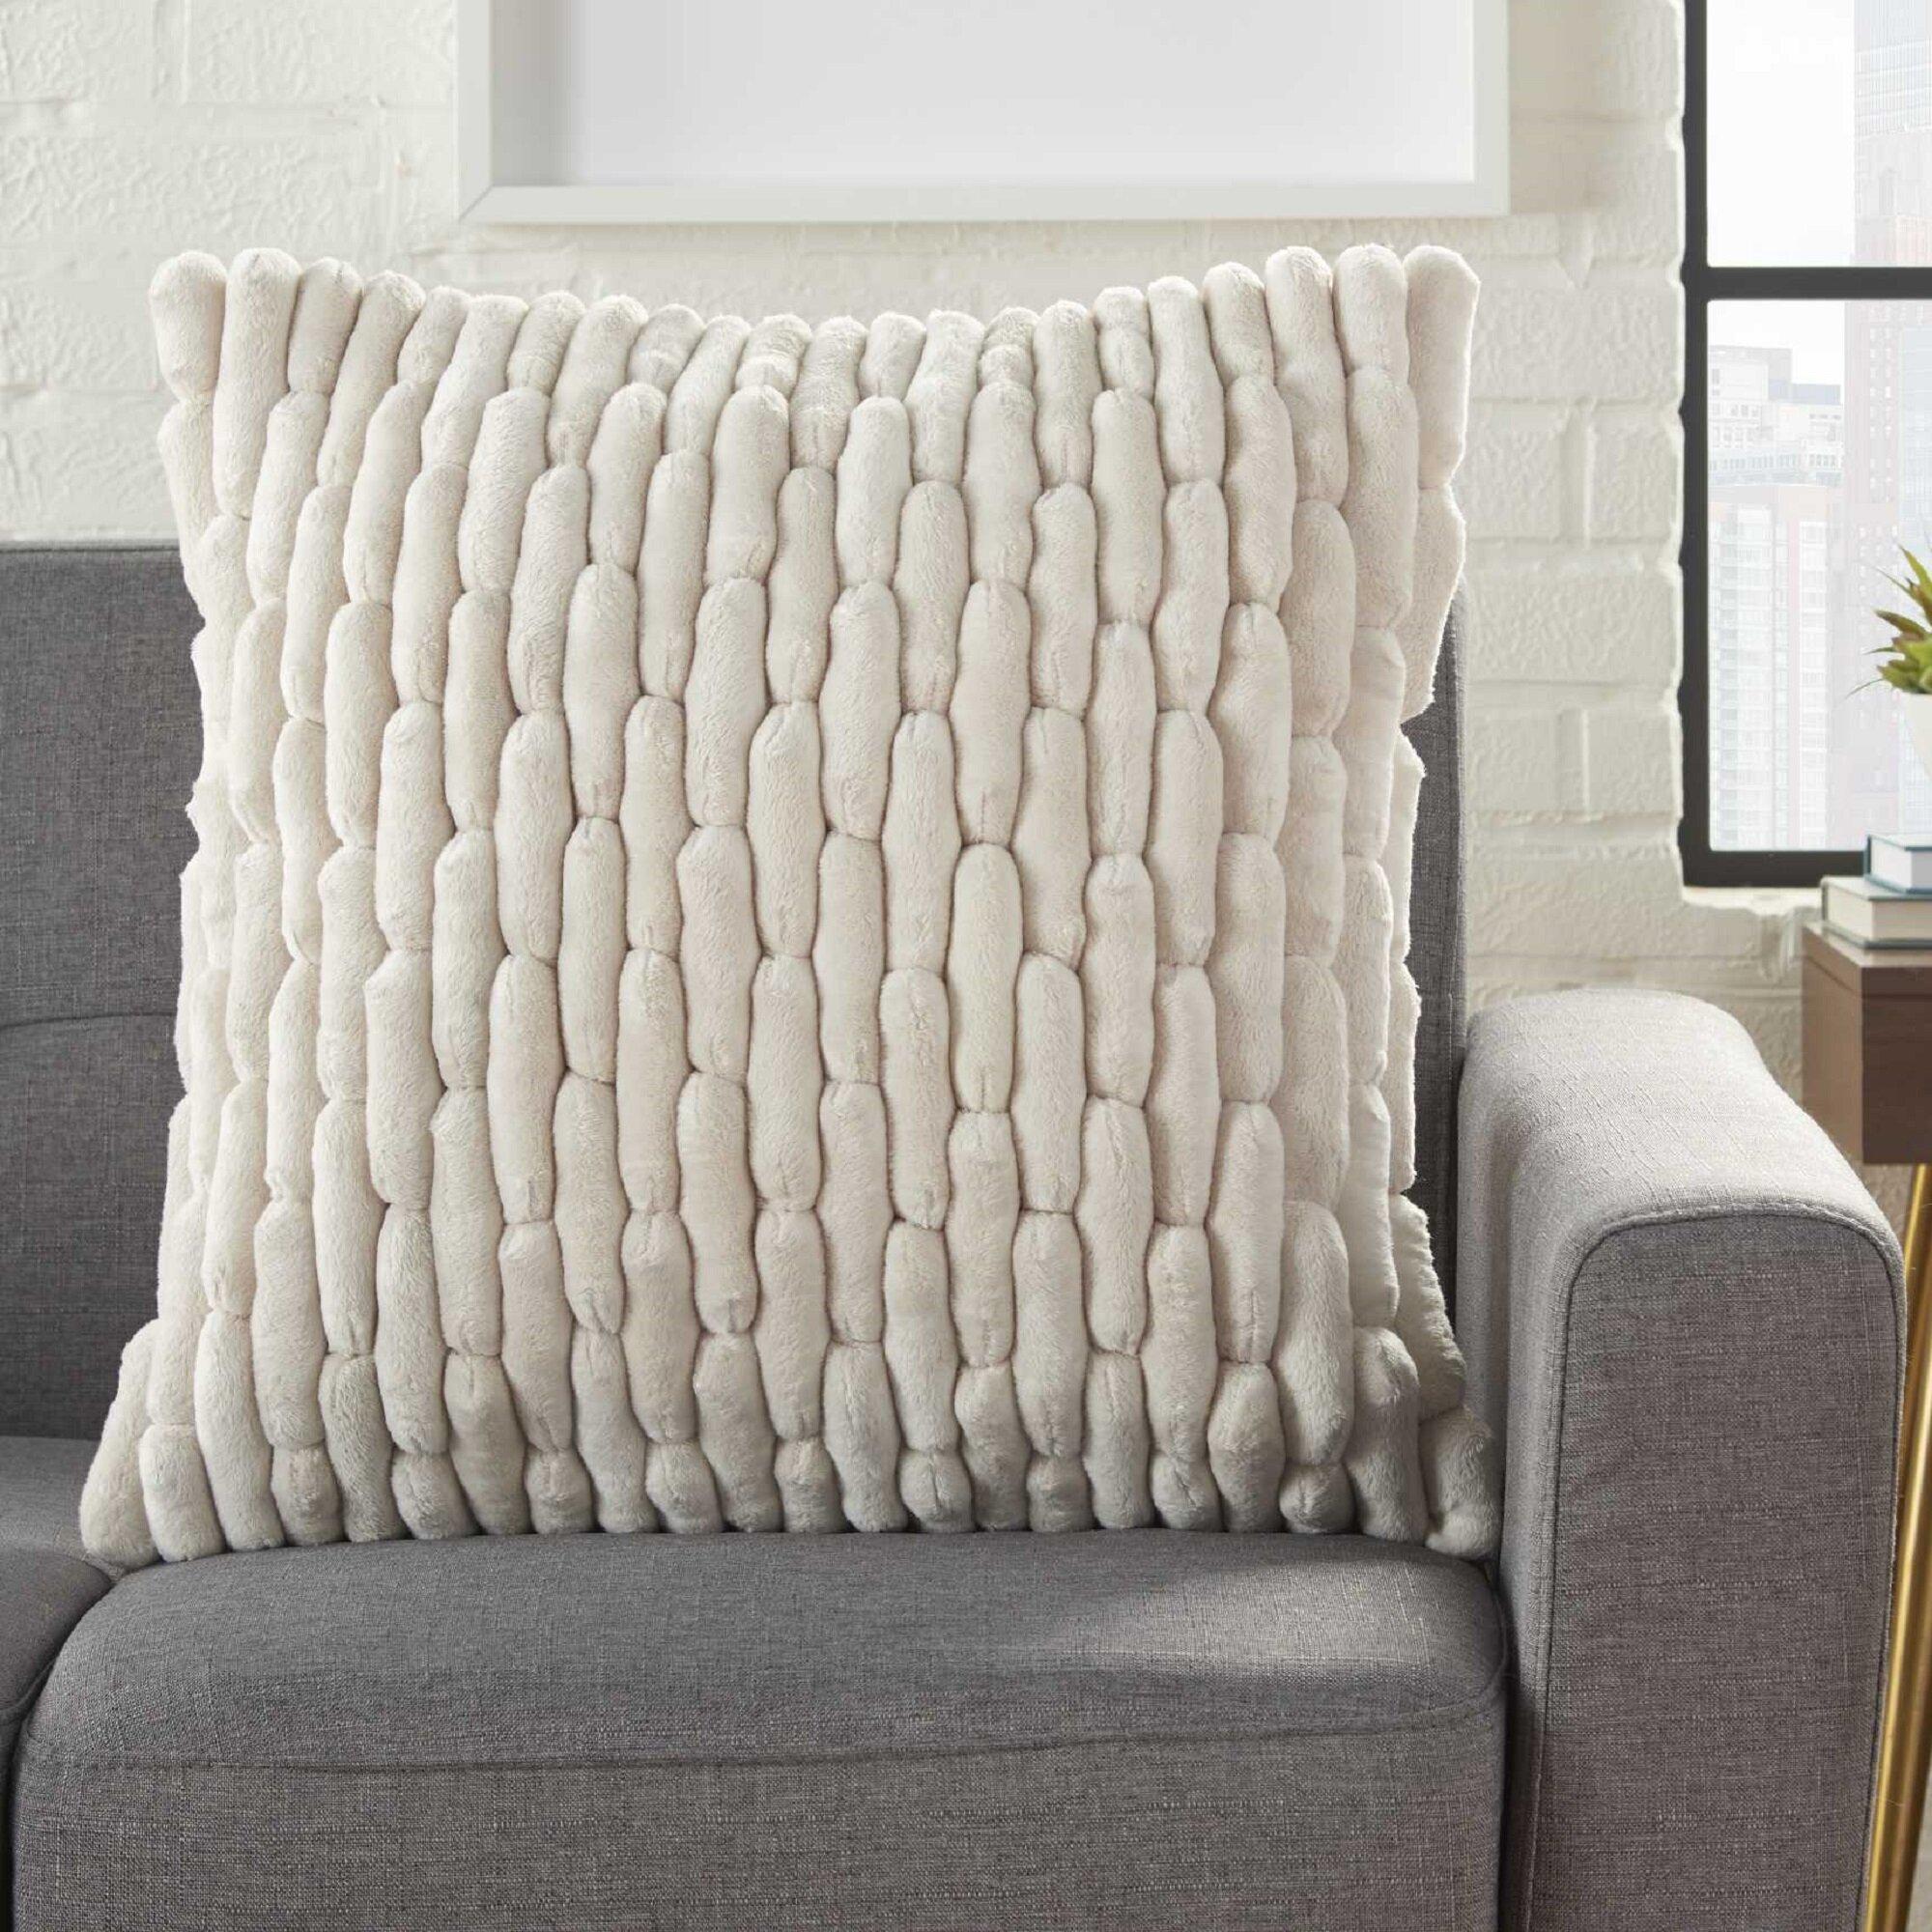 Gracie Oaks Dejong Textured Solid Throw Pillow Reviews Wayfair